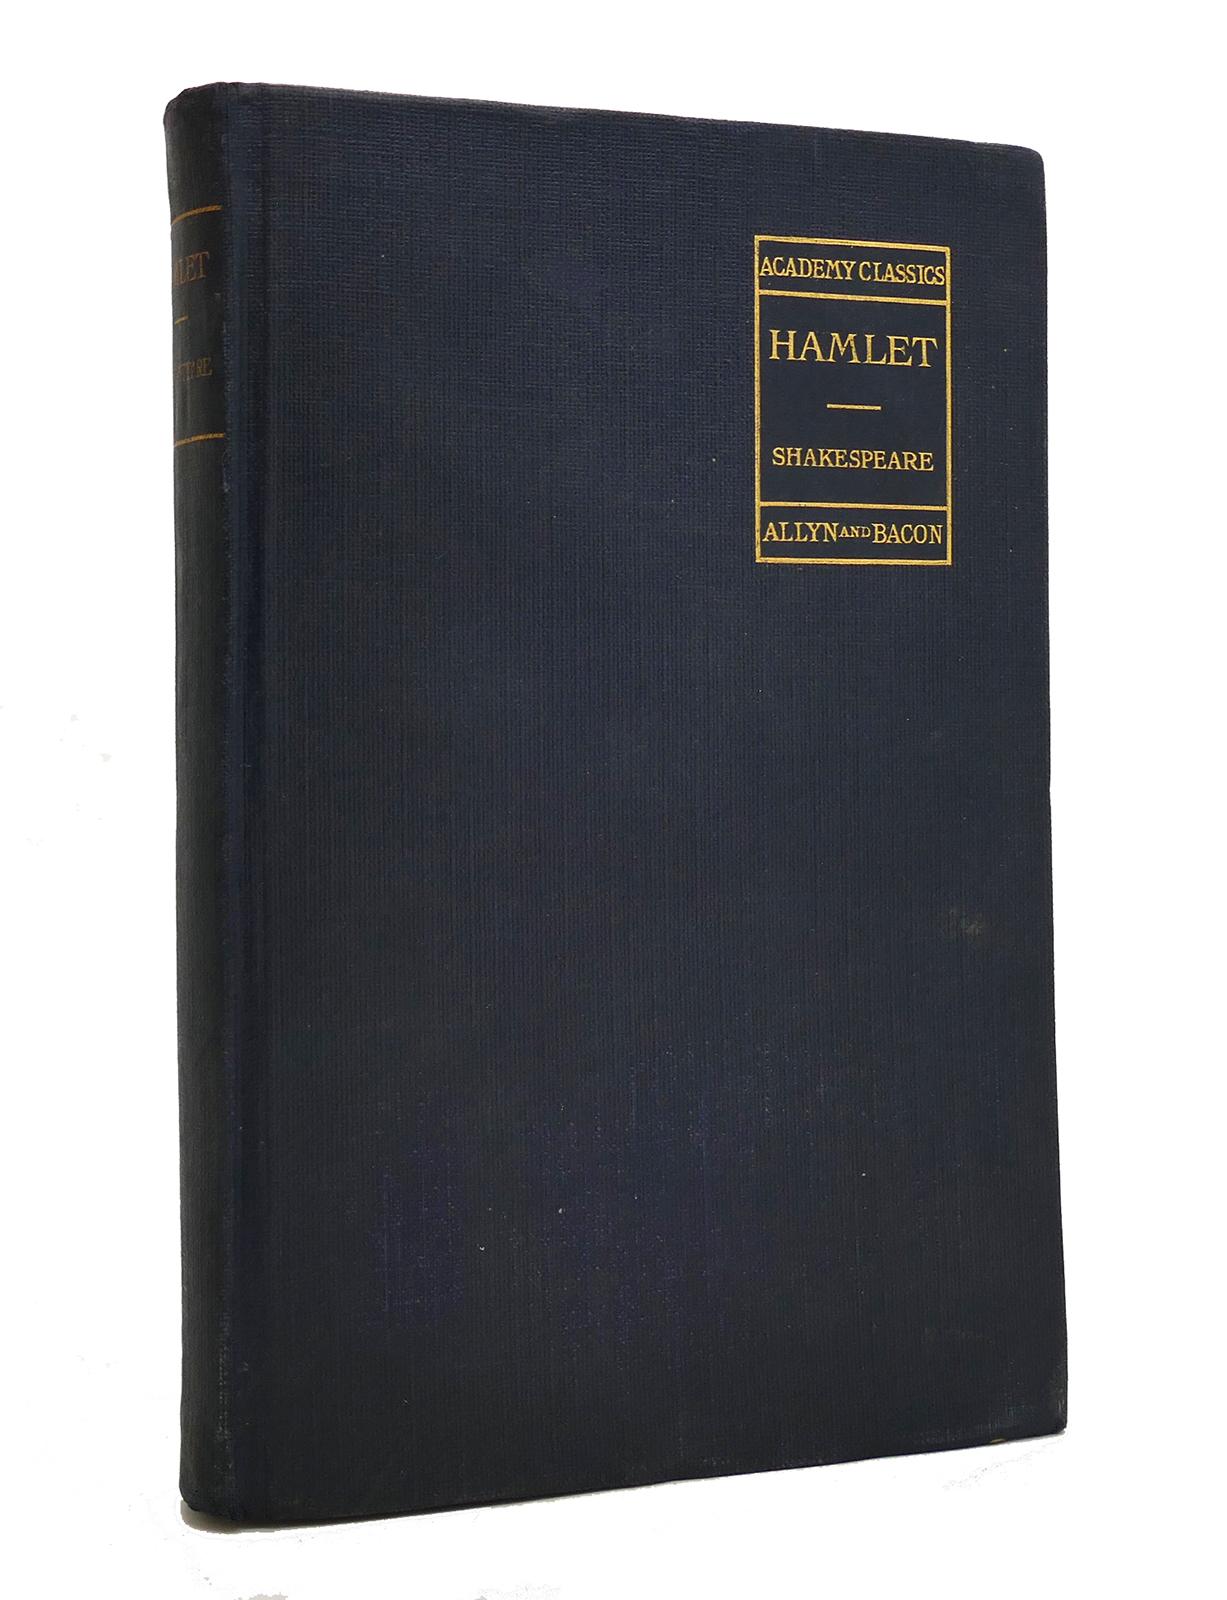 Hamlet book image